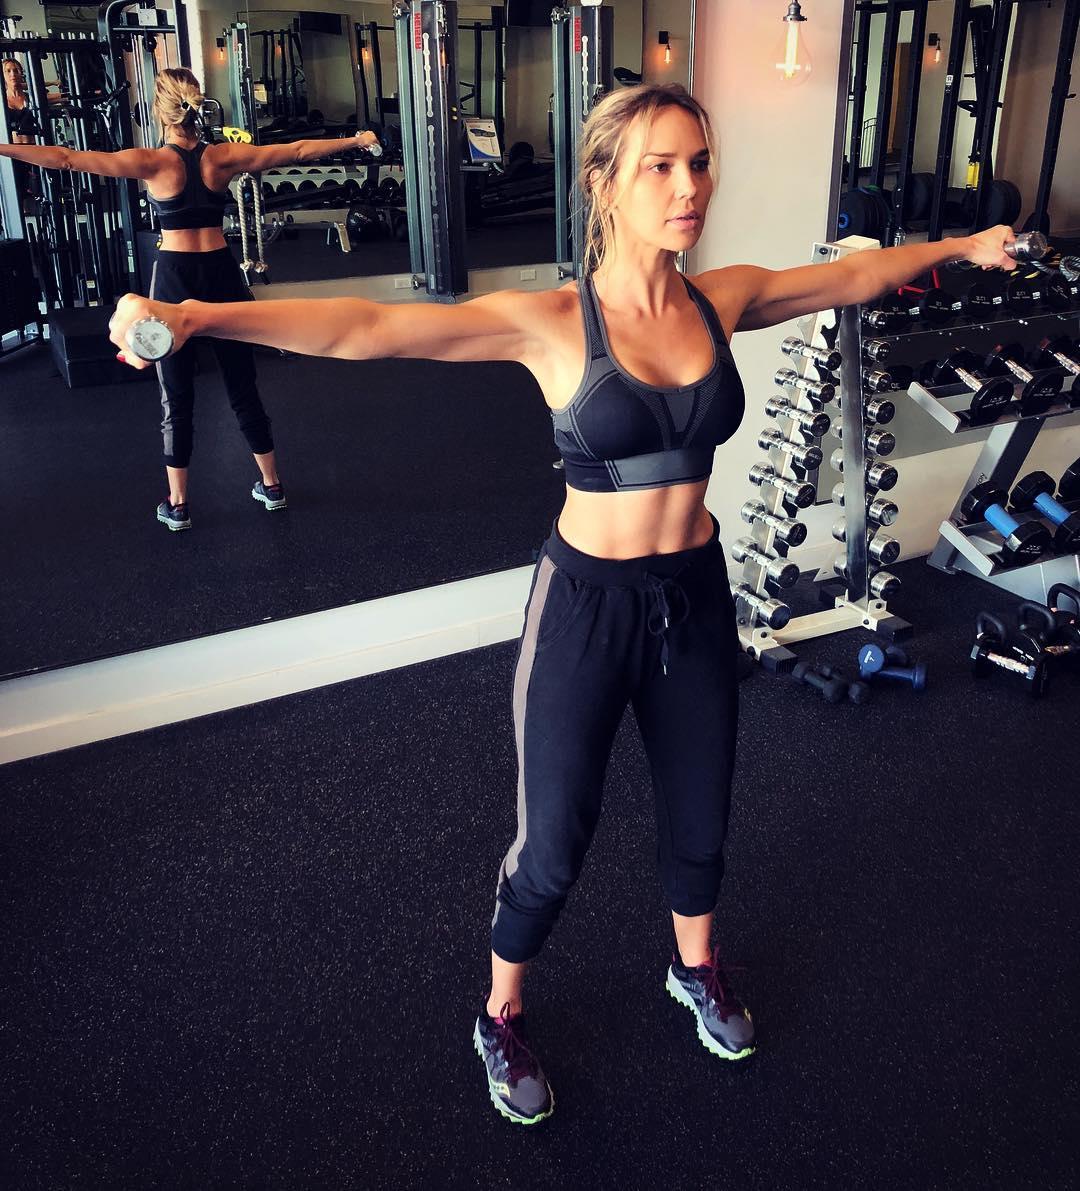 Ариэль Кеббел: I hate weights. But I love my trainer. @madfit_inc